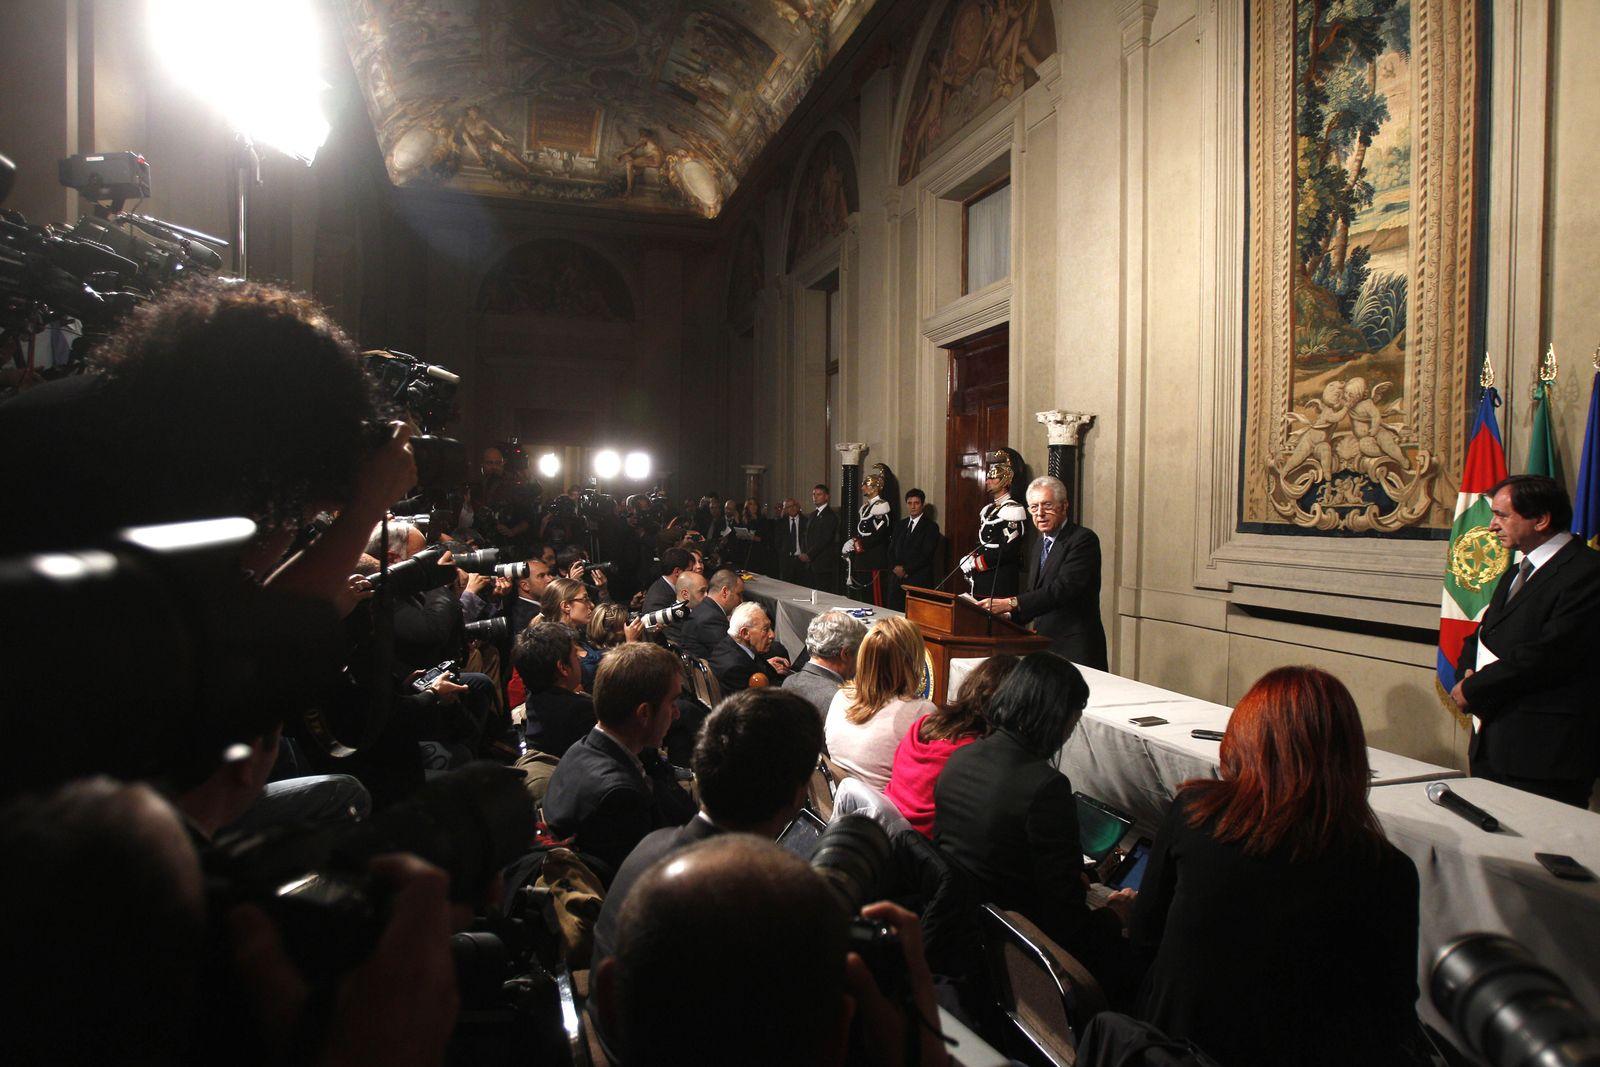 Italy Mario Monti